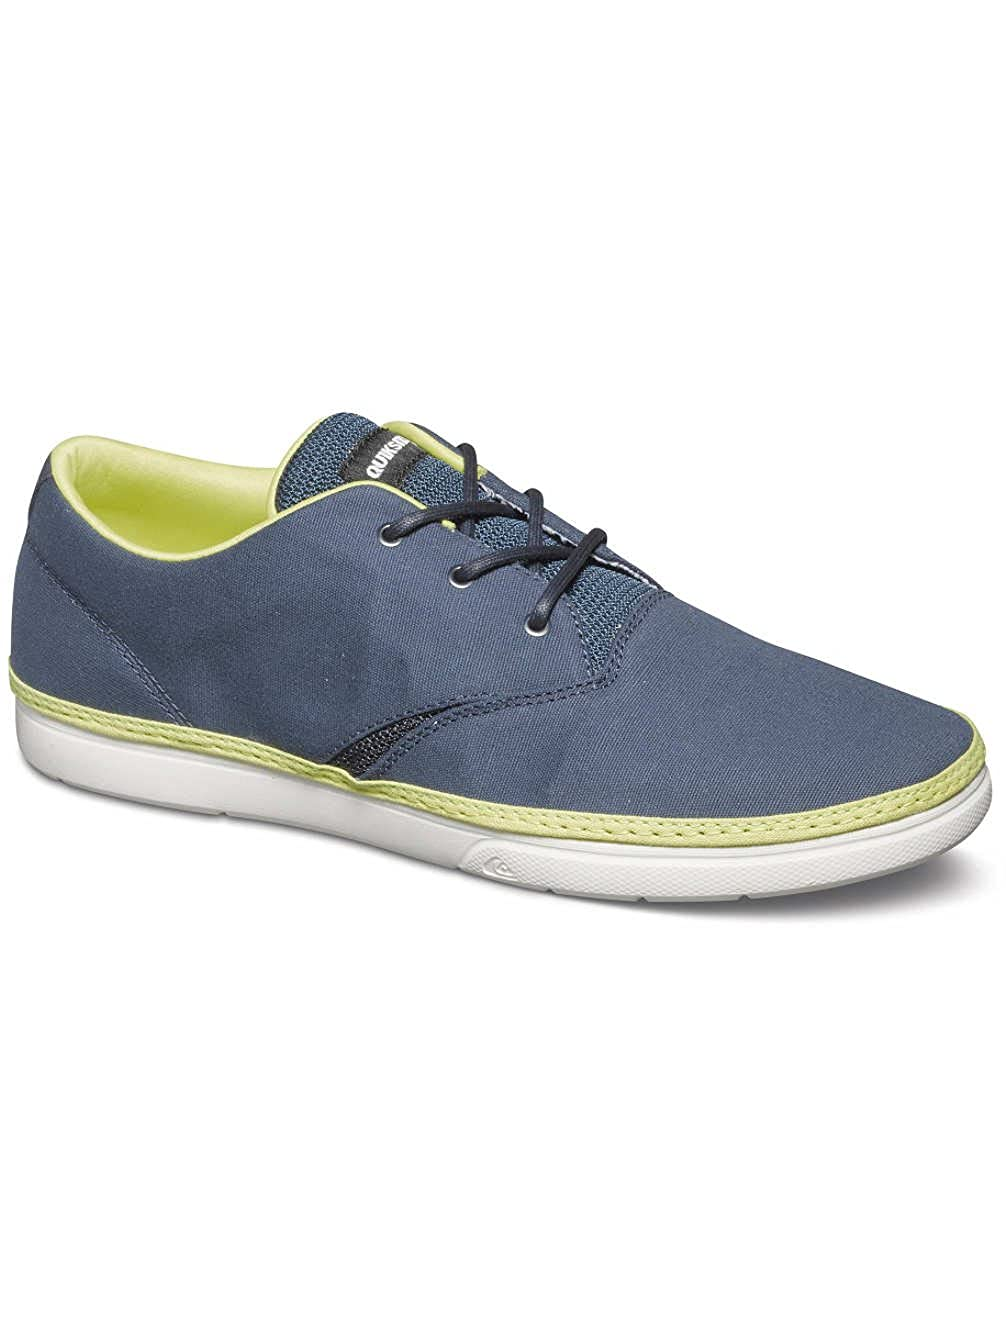 QuikSilber Trestles Canvas - Schuhe Für Männer AQYS700003 AQYS700003 AQYS700003 ec8f90